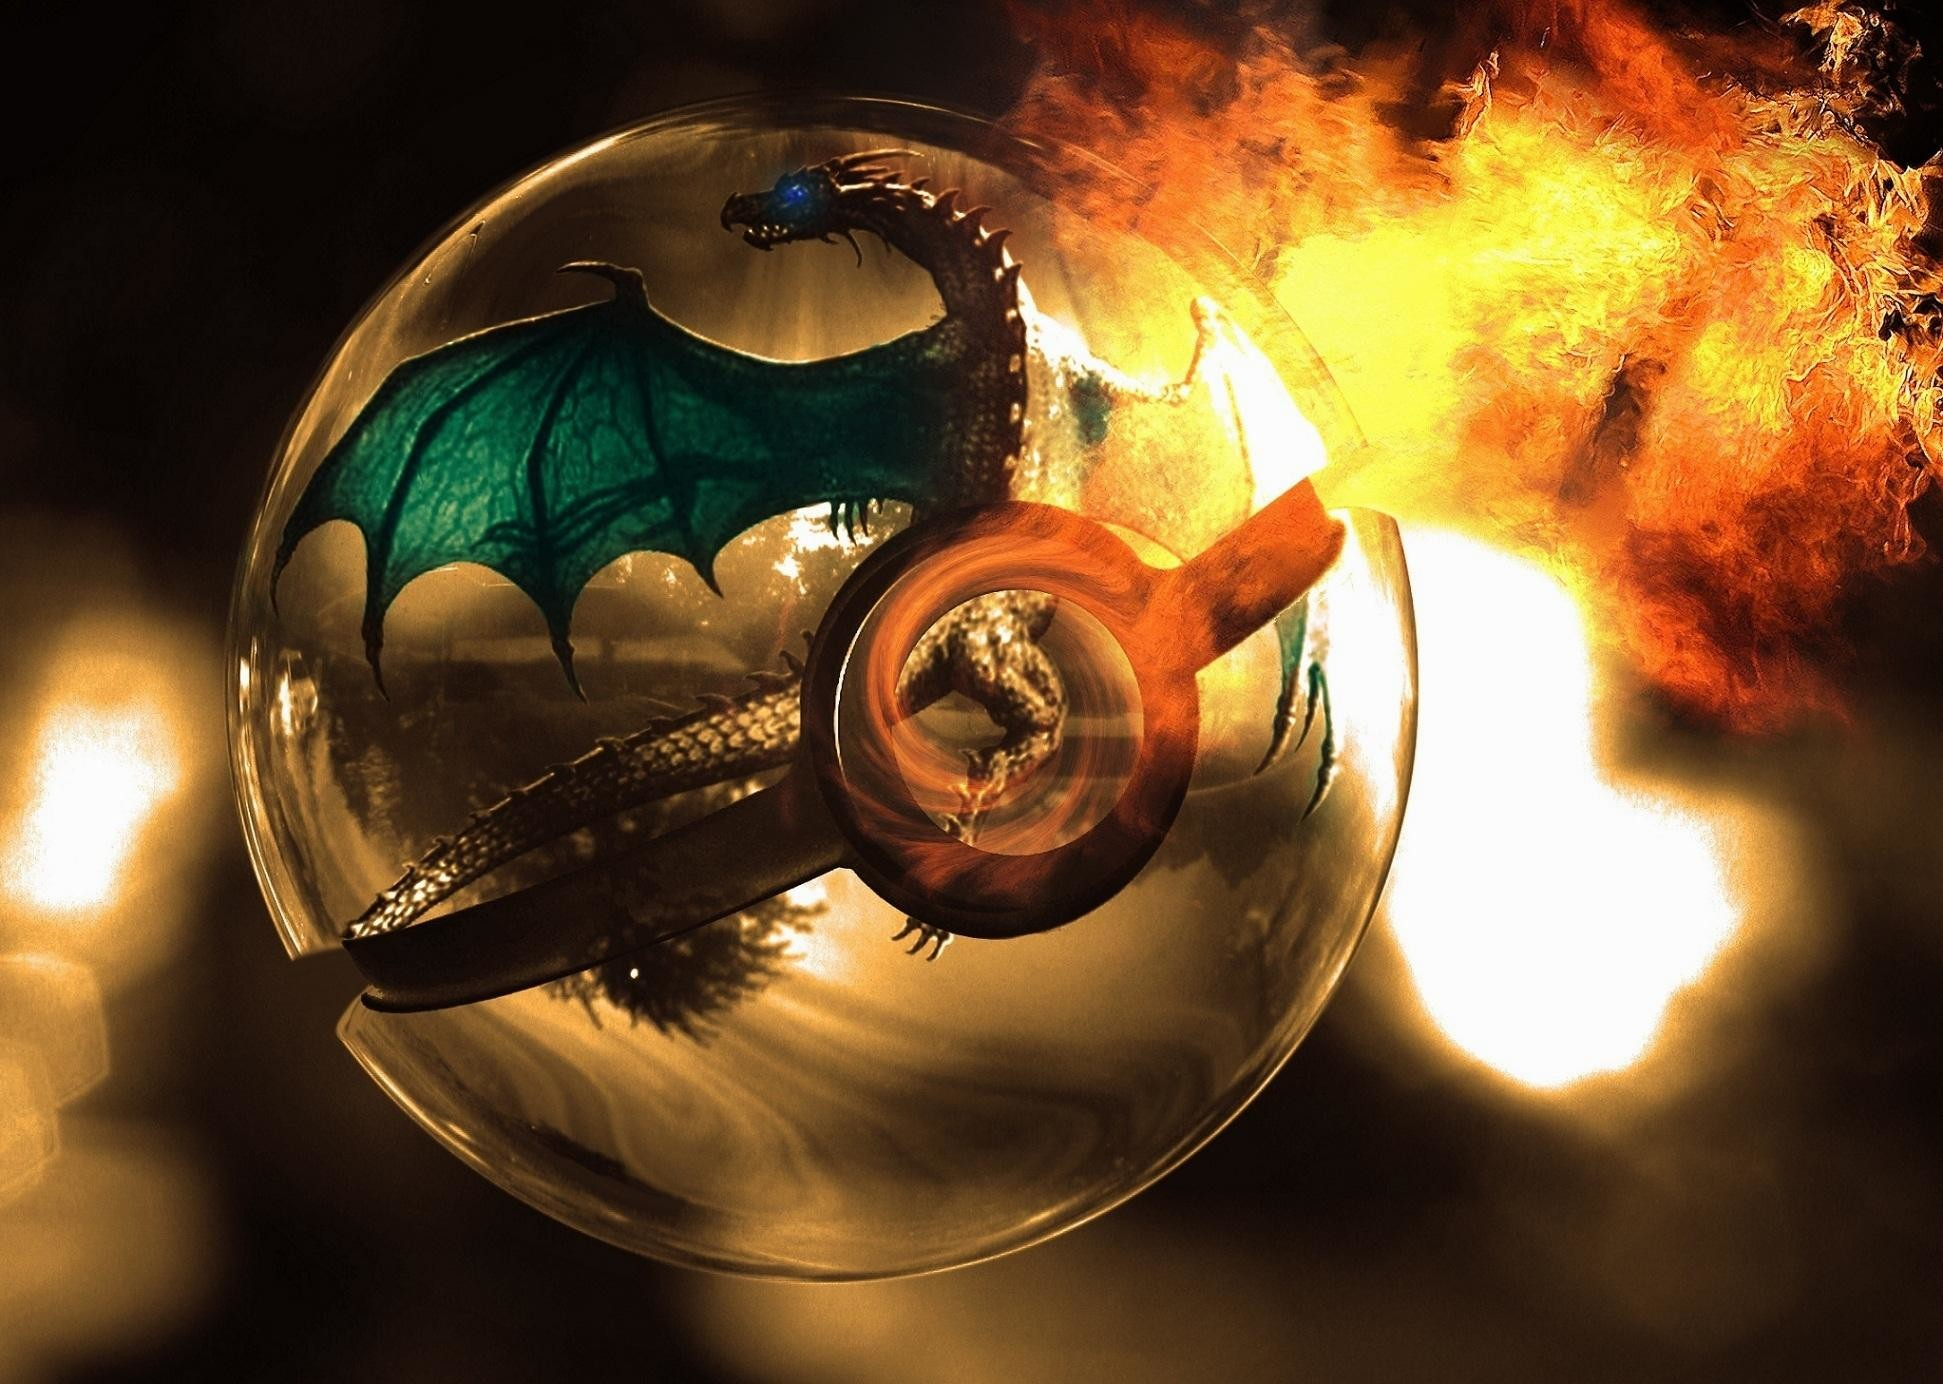 Pokemon-Charizard-HD-Wallpaper-001